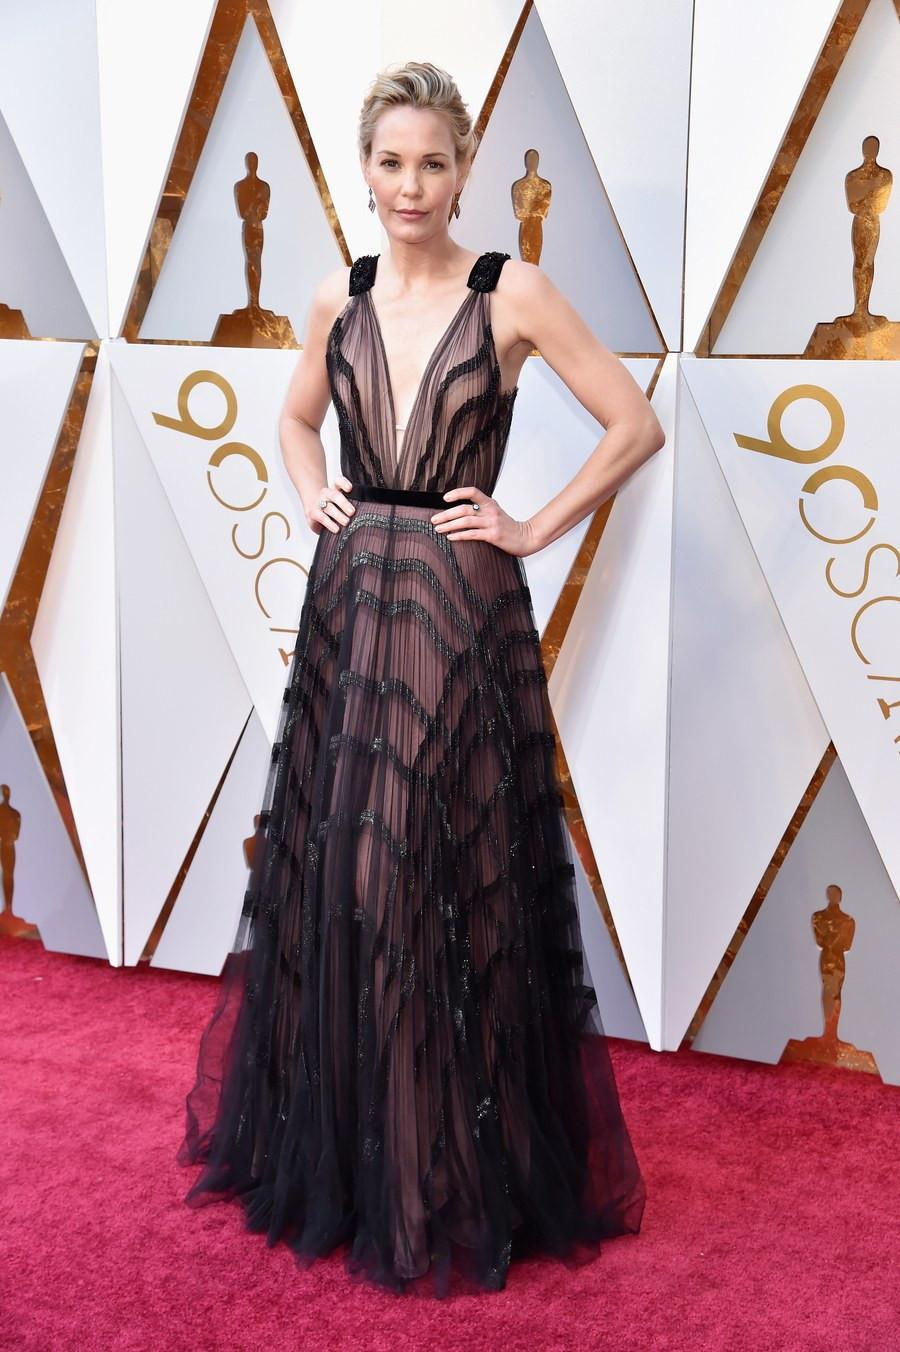 Leslie Bibb wearing J. Mendel Oscars 2018